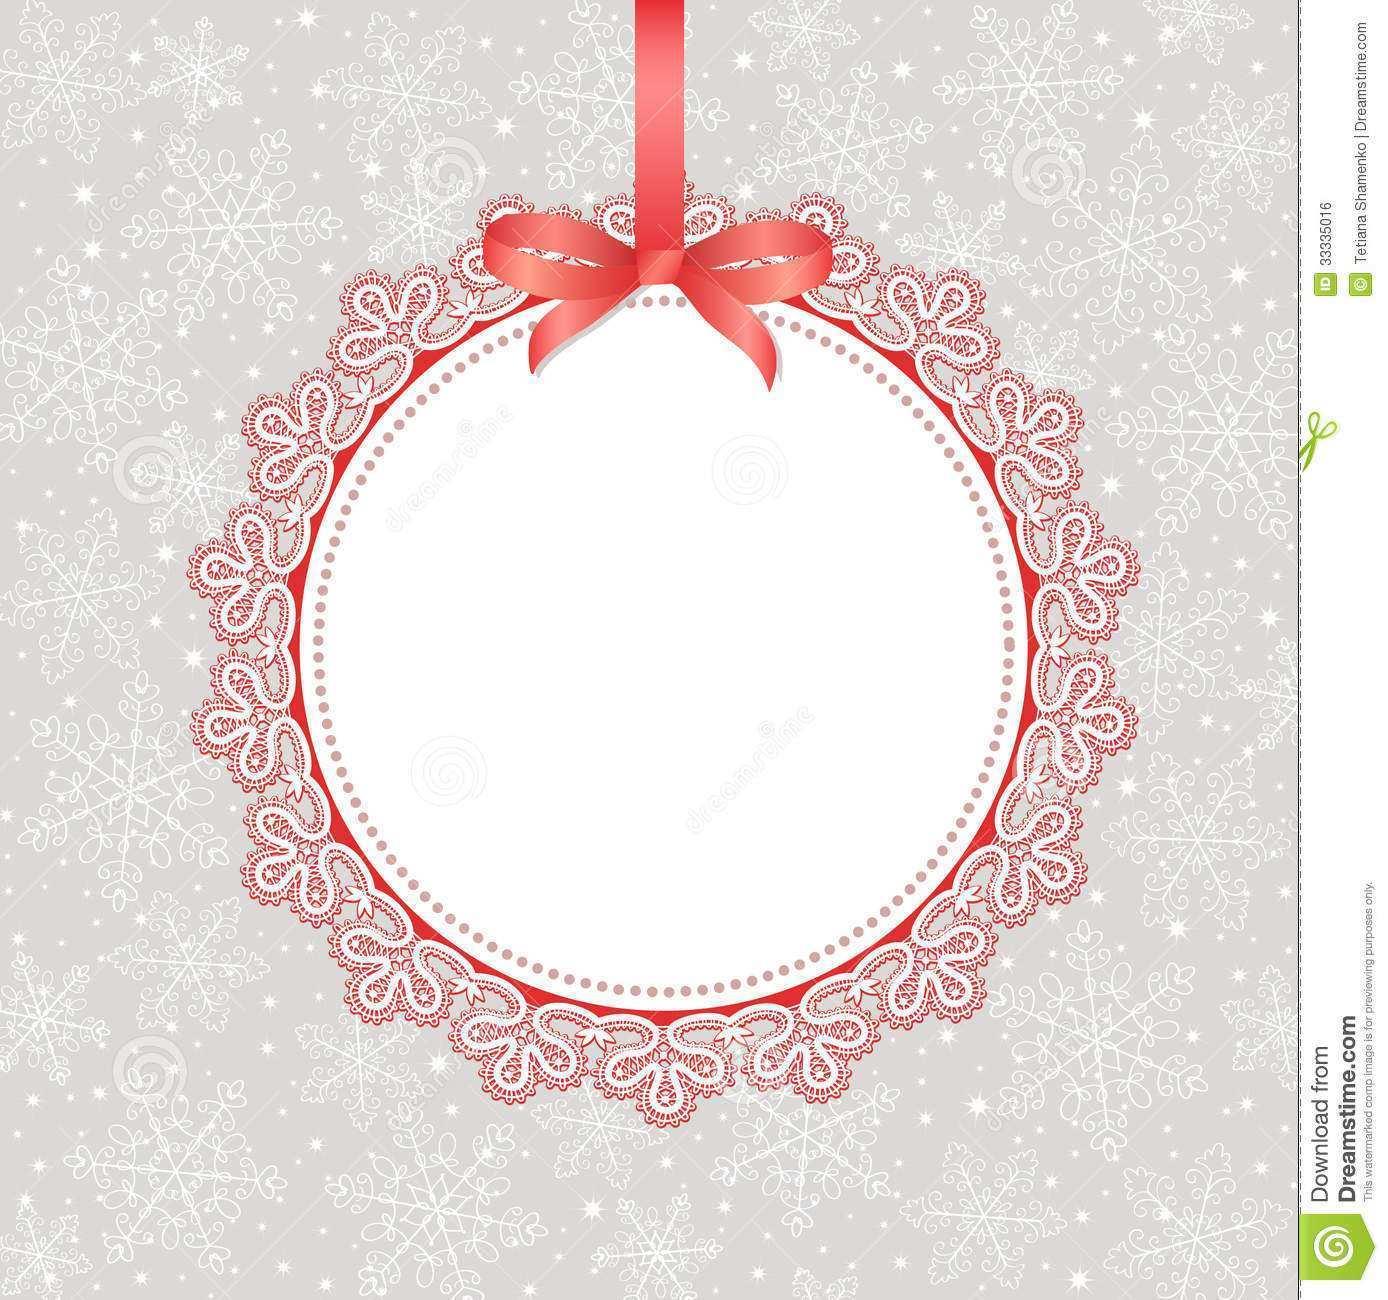 46 Creative Christmas Card Ideas Templates in Word for Christmas Card Ideas Templates